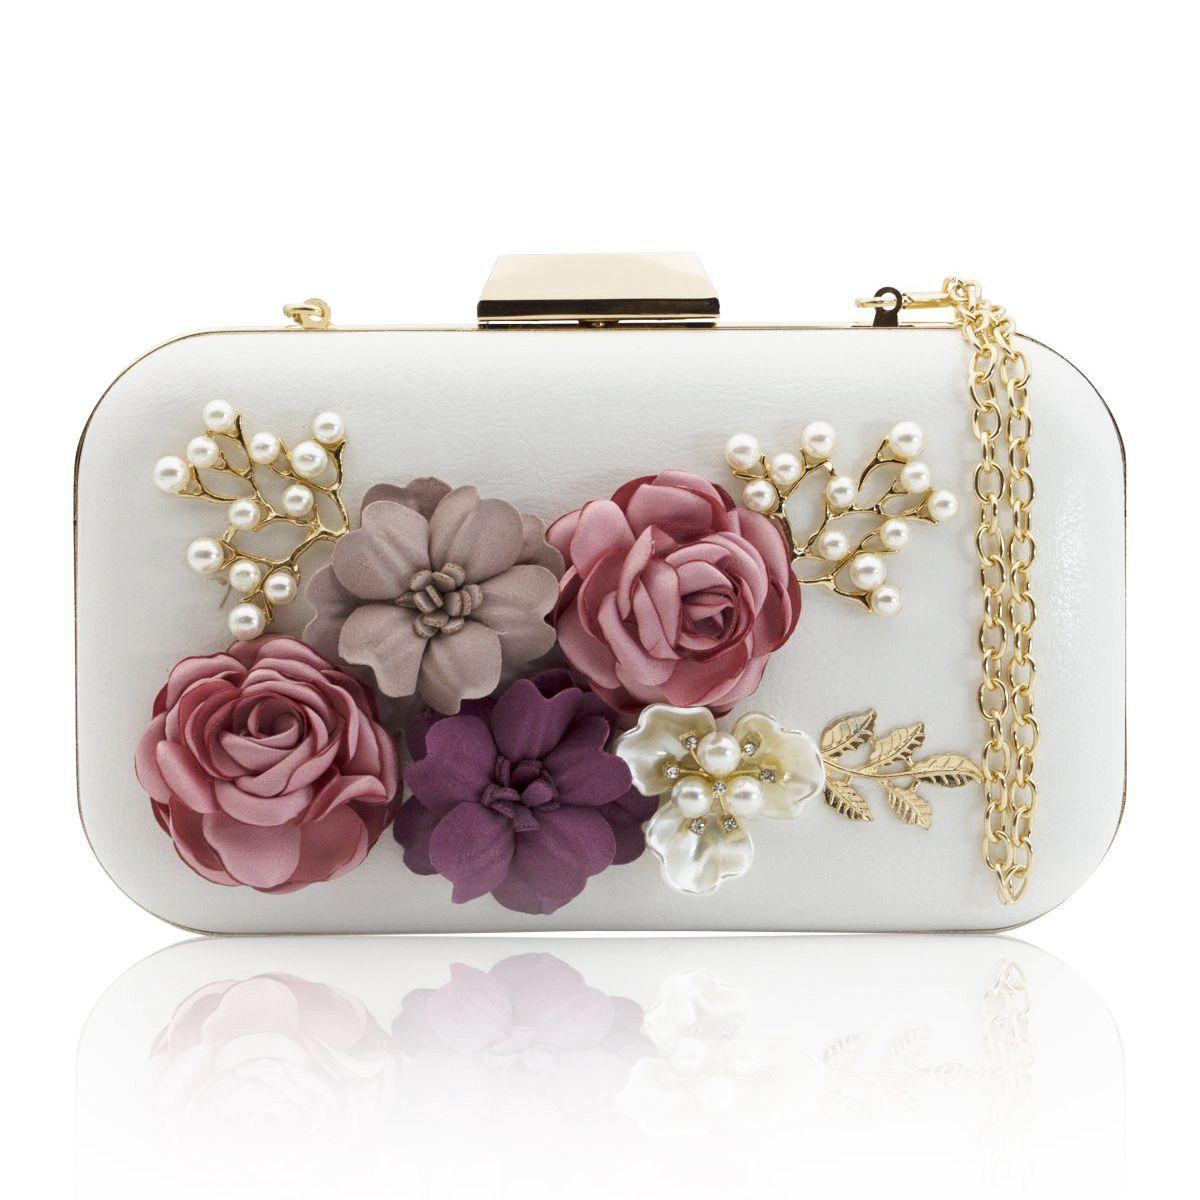 TFTP-Women Clutches Purses Bags Flower Leather Envelope Pearl Wallet Evening Handbag(white)